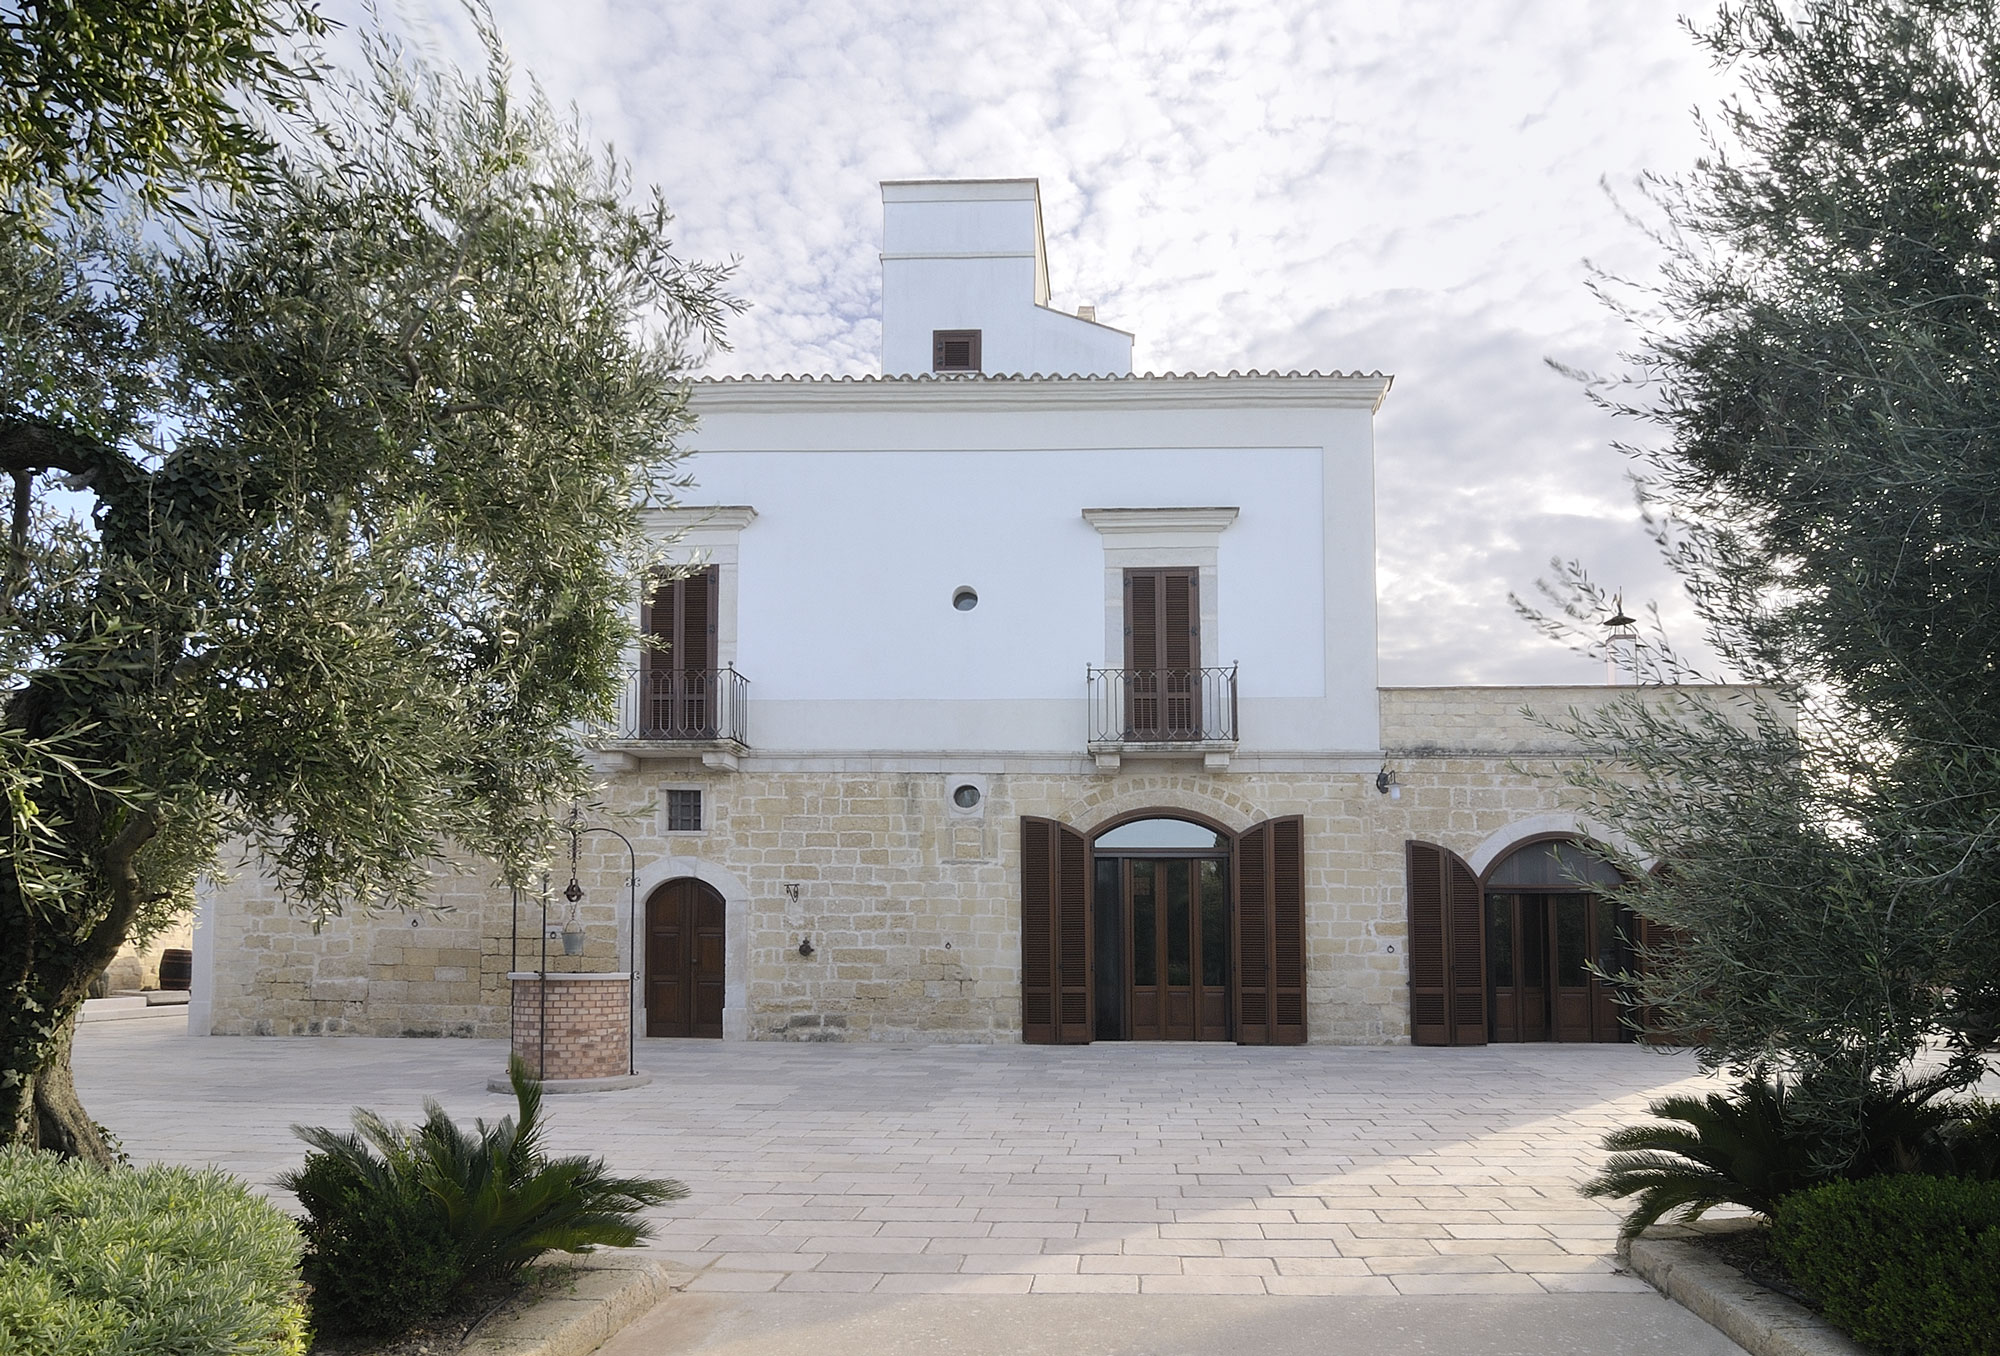 Architetto Giuseppe Matarrese